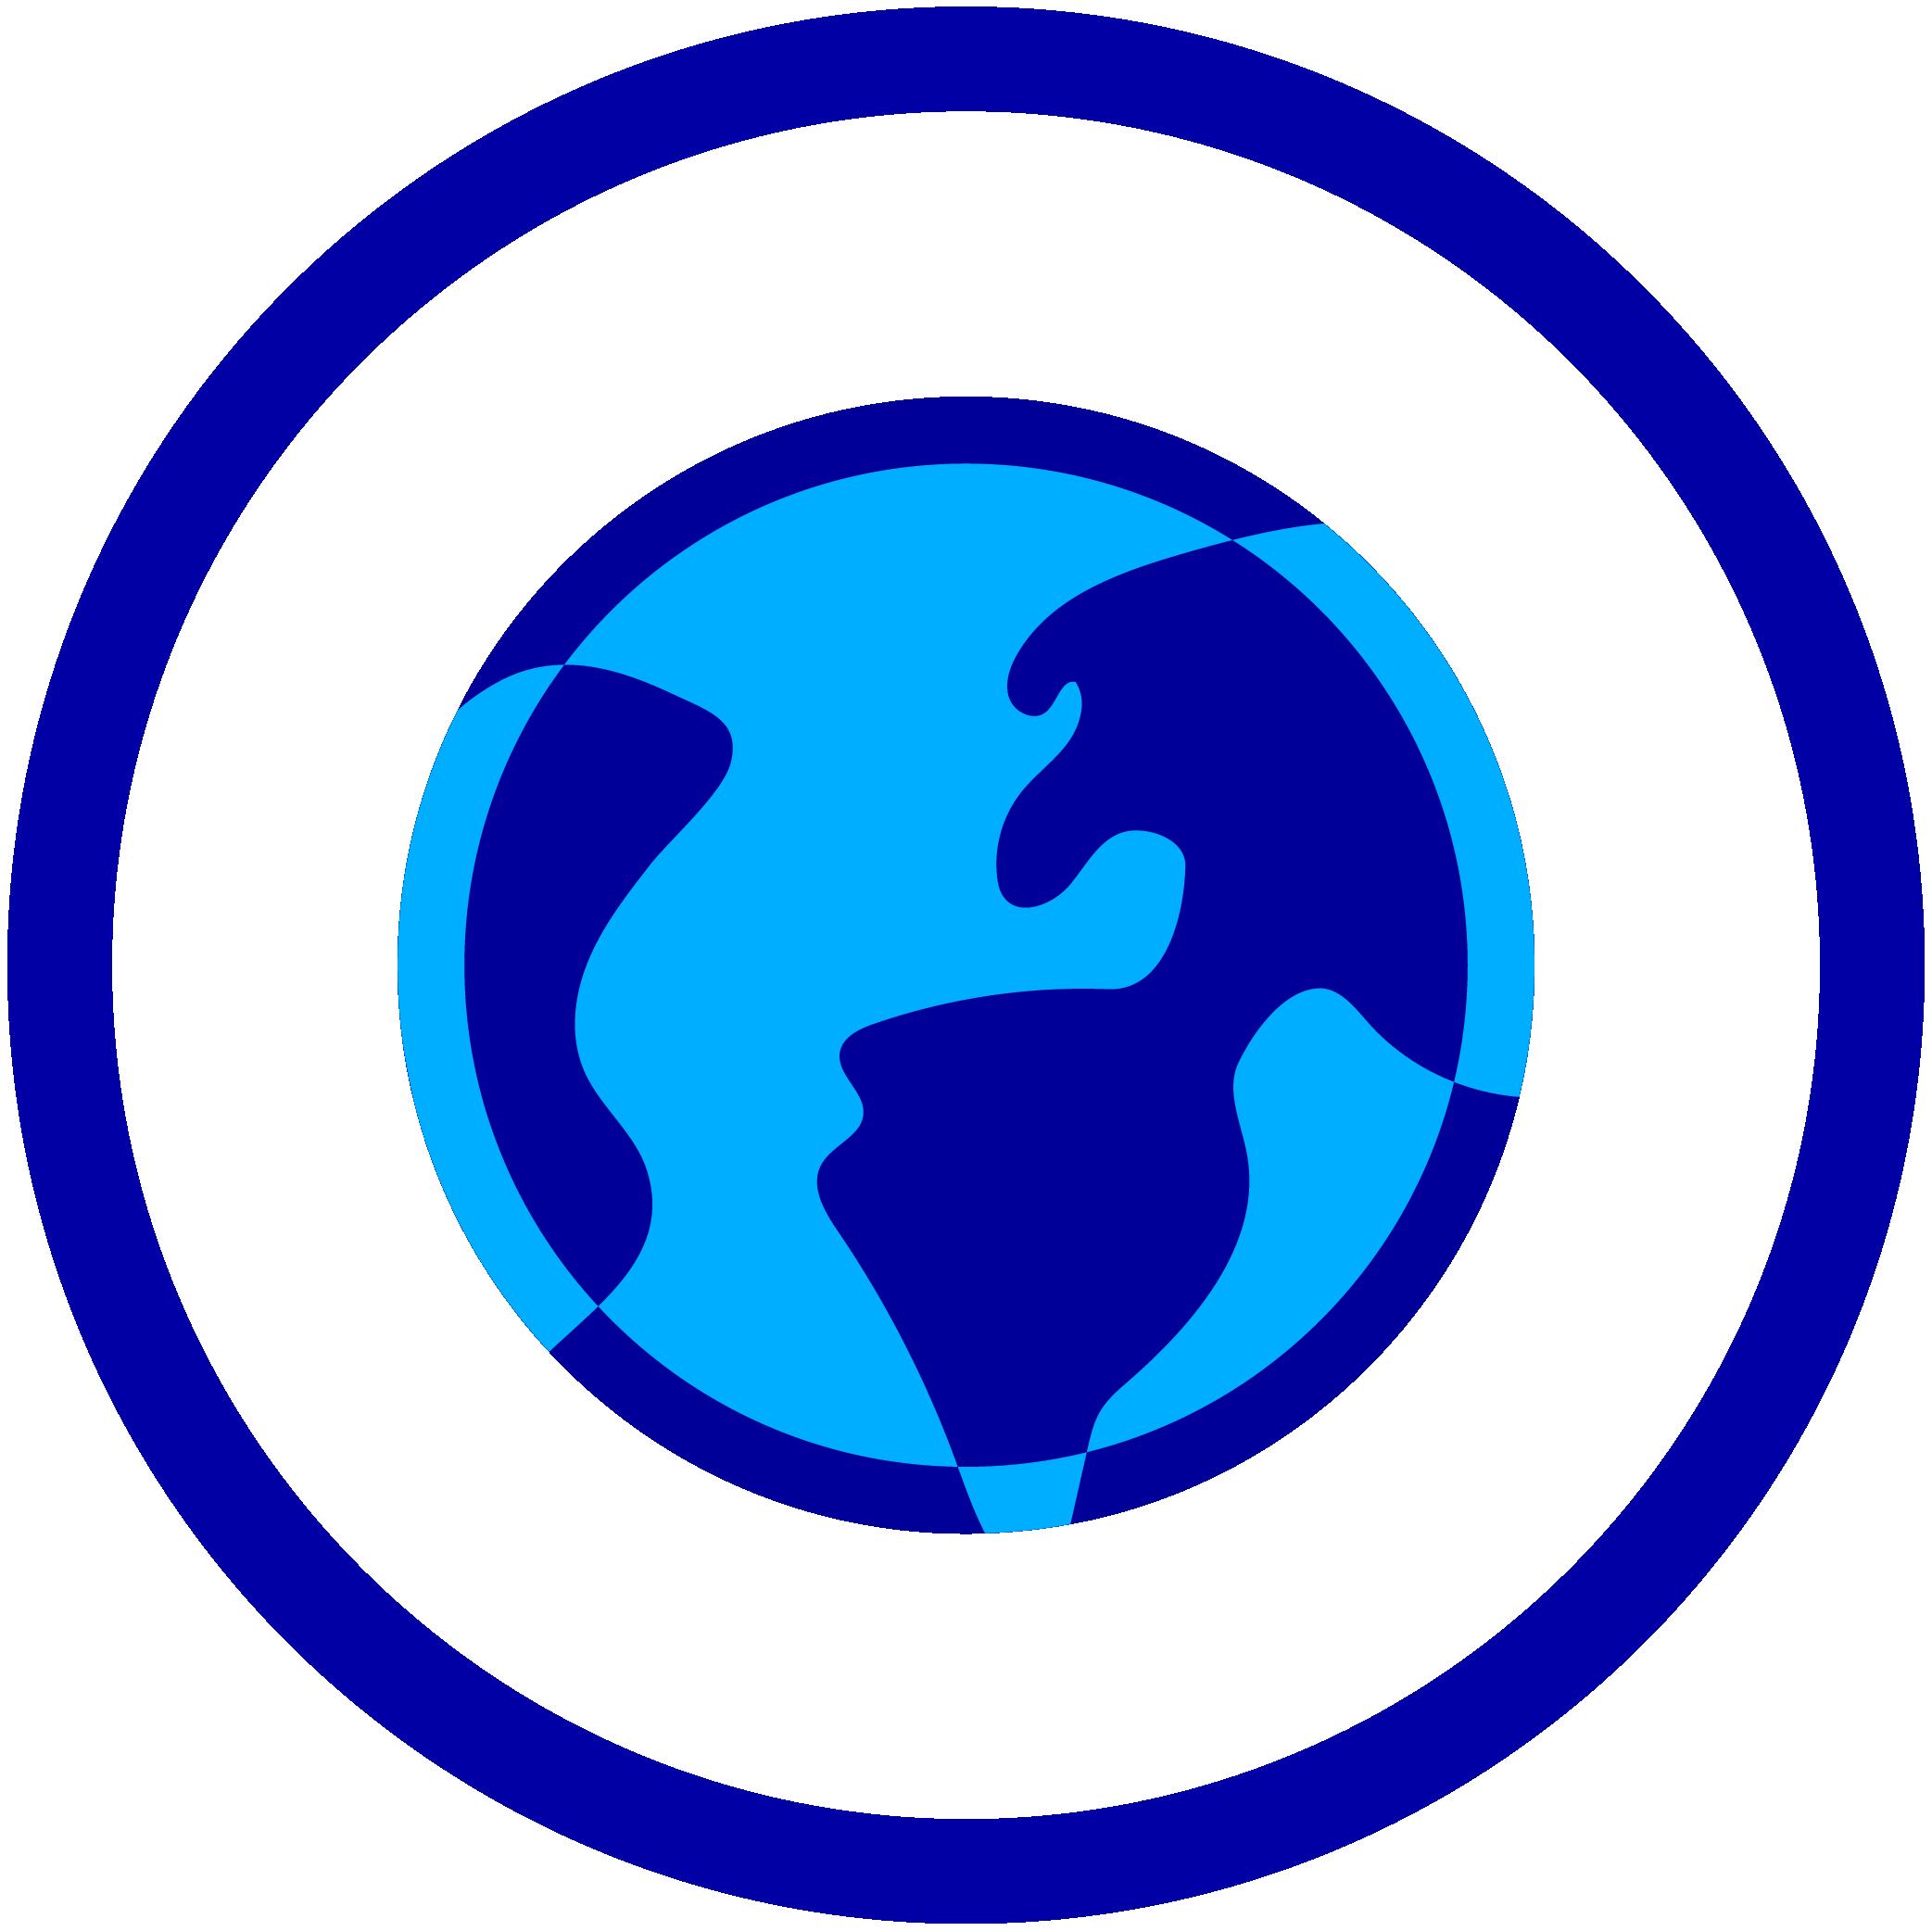 https://co.fi-group.com/wp-content/uploads/sites/14/2021/02/blue-icons-set_1-13.png